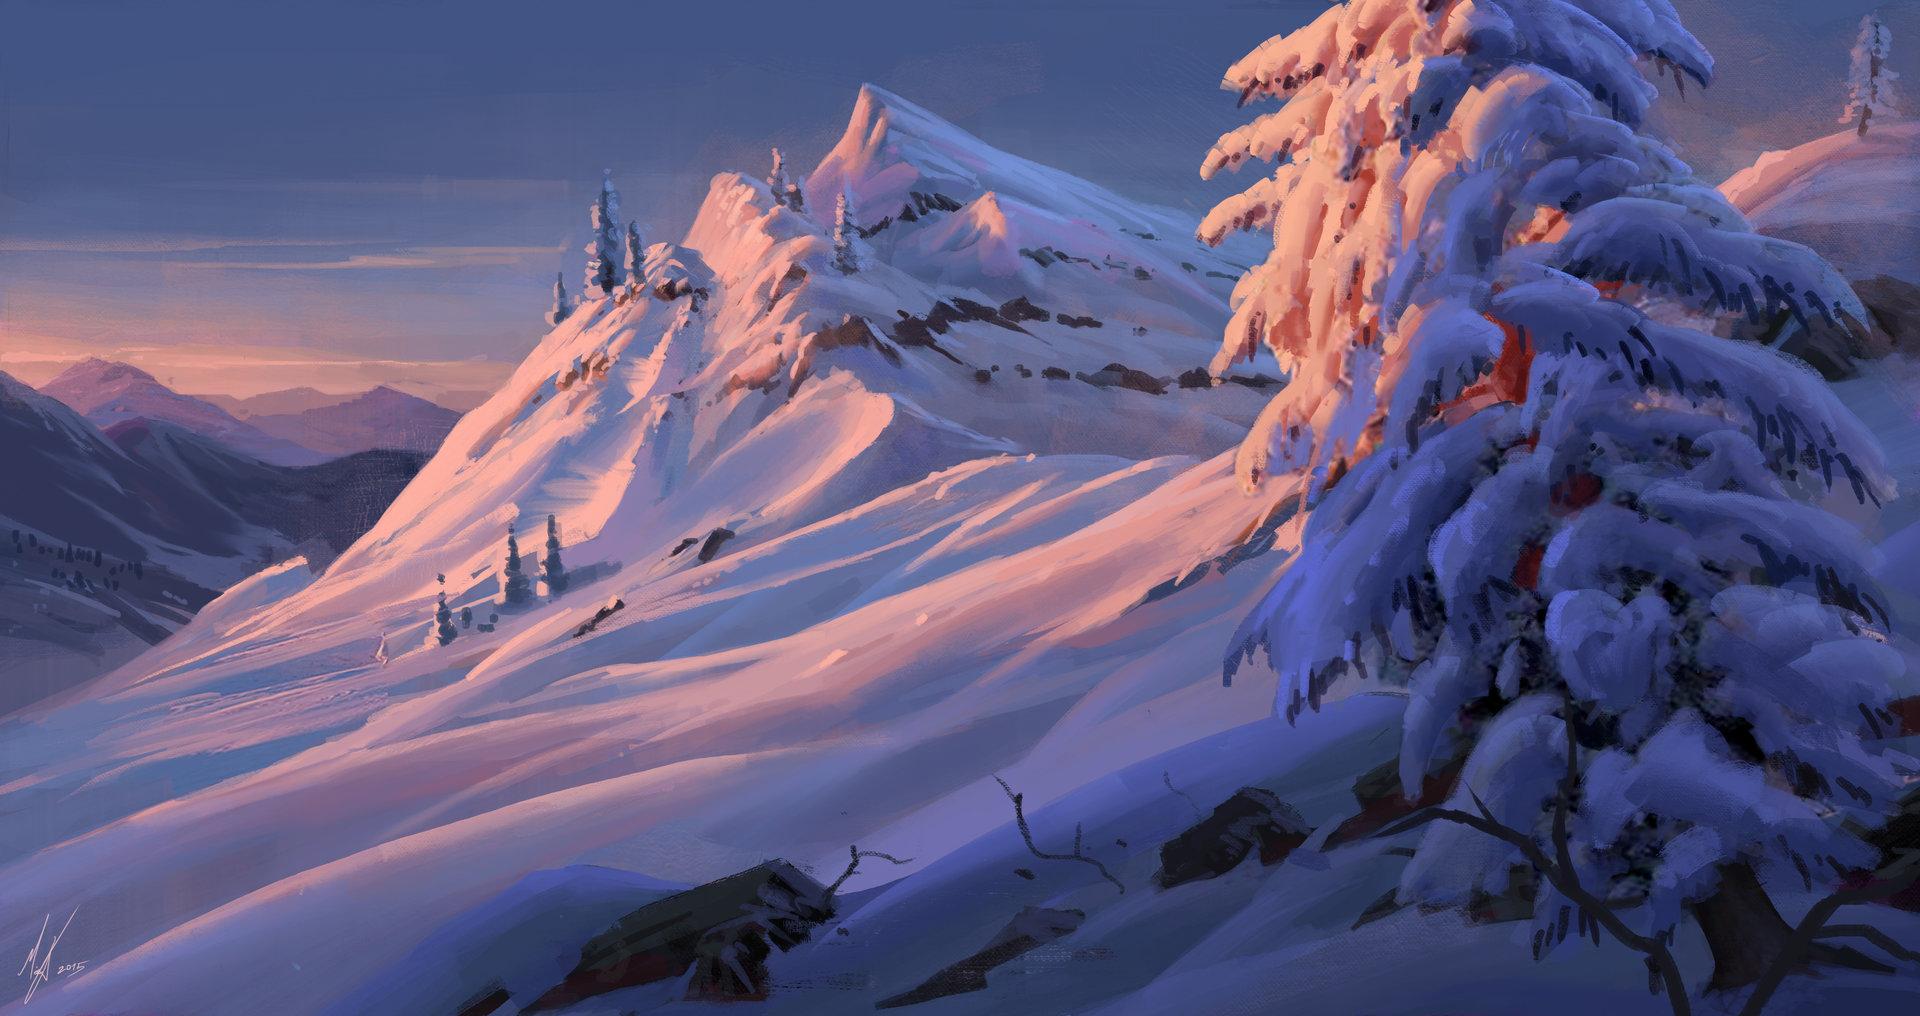 Michal kus snowy speedie4